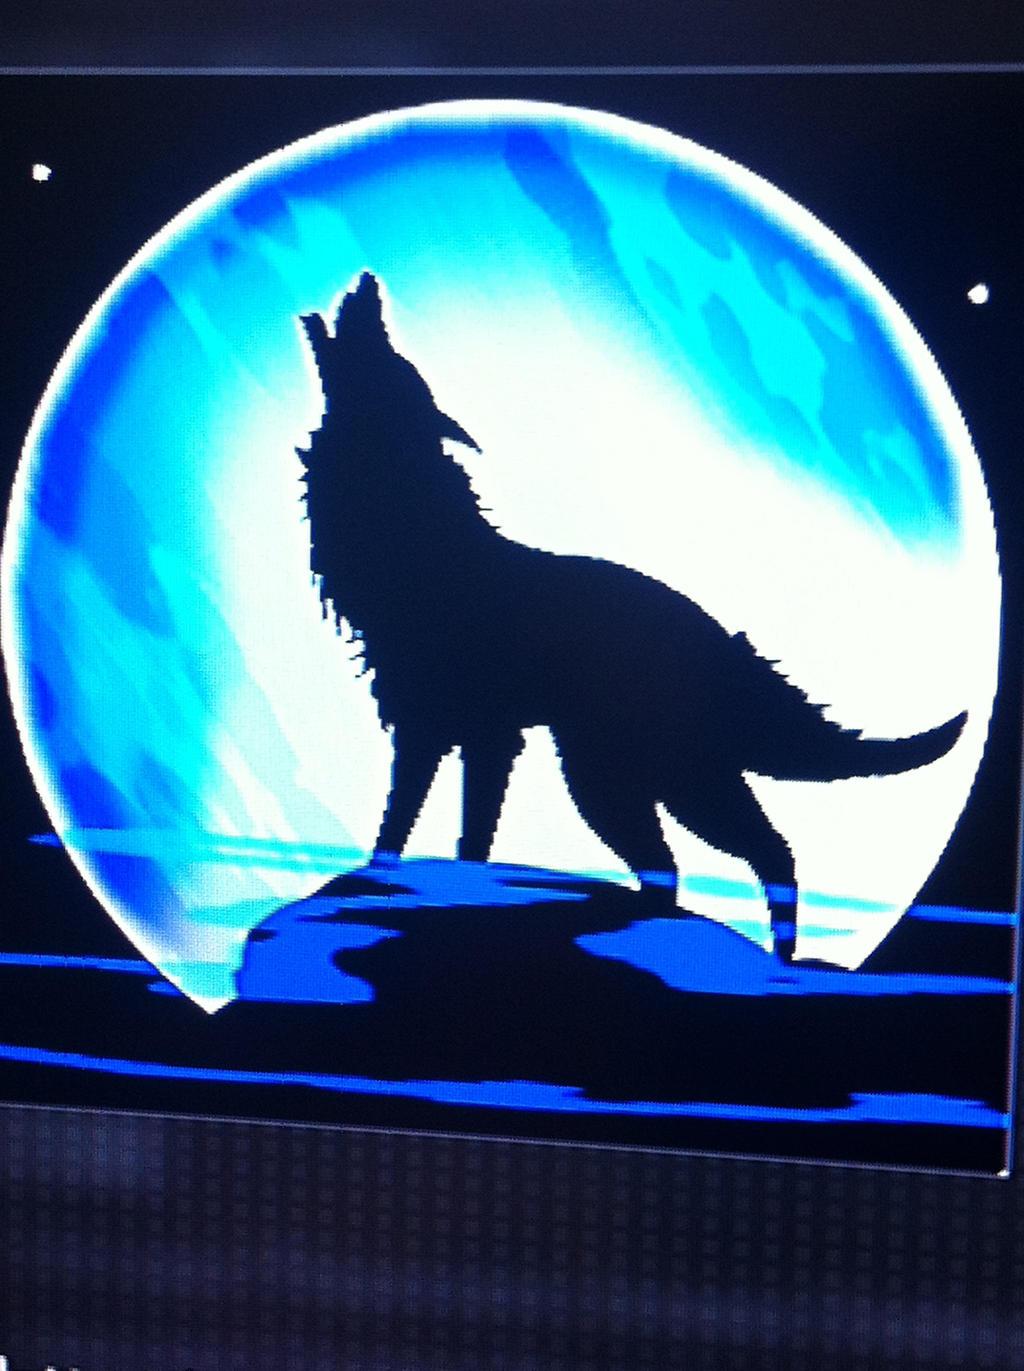 emblem three moons - photo #35